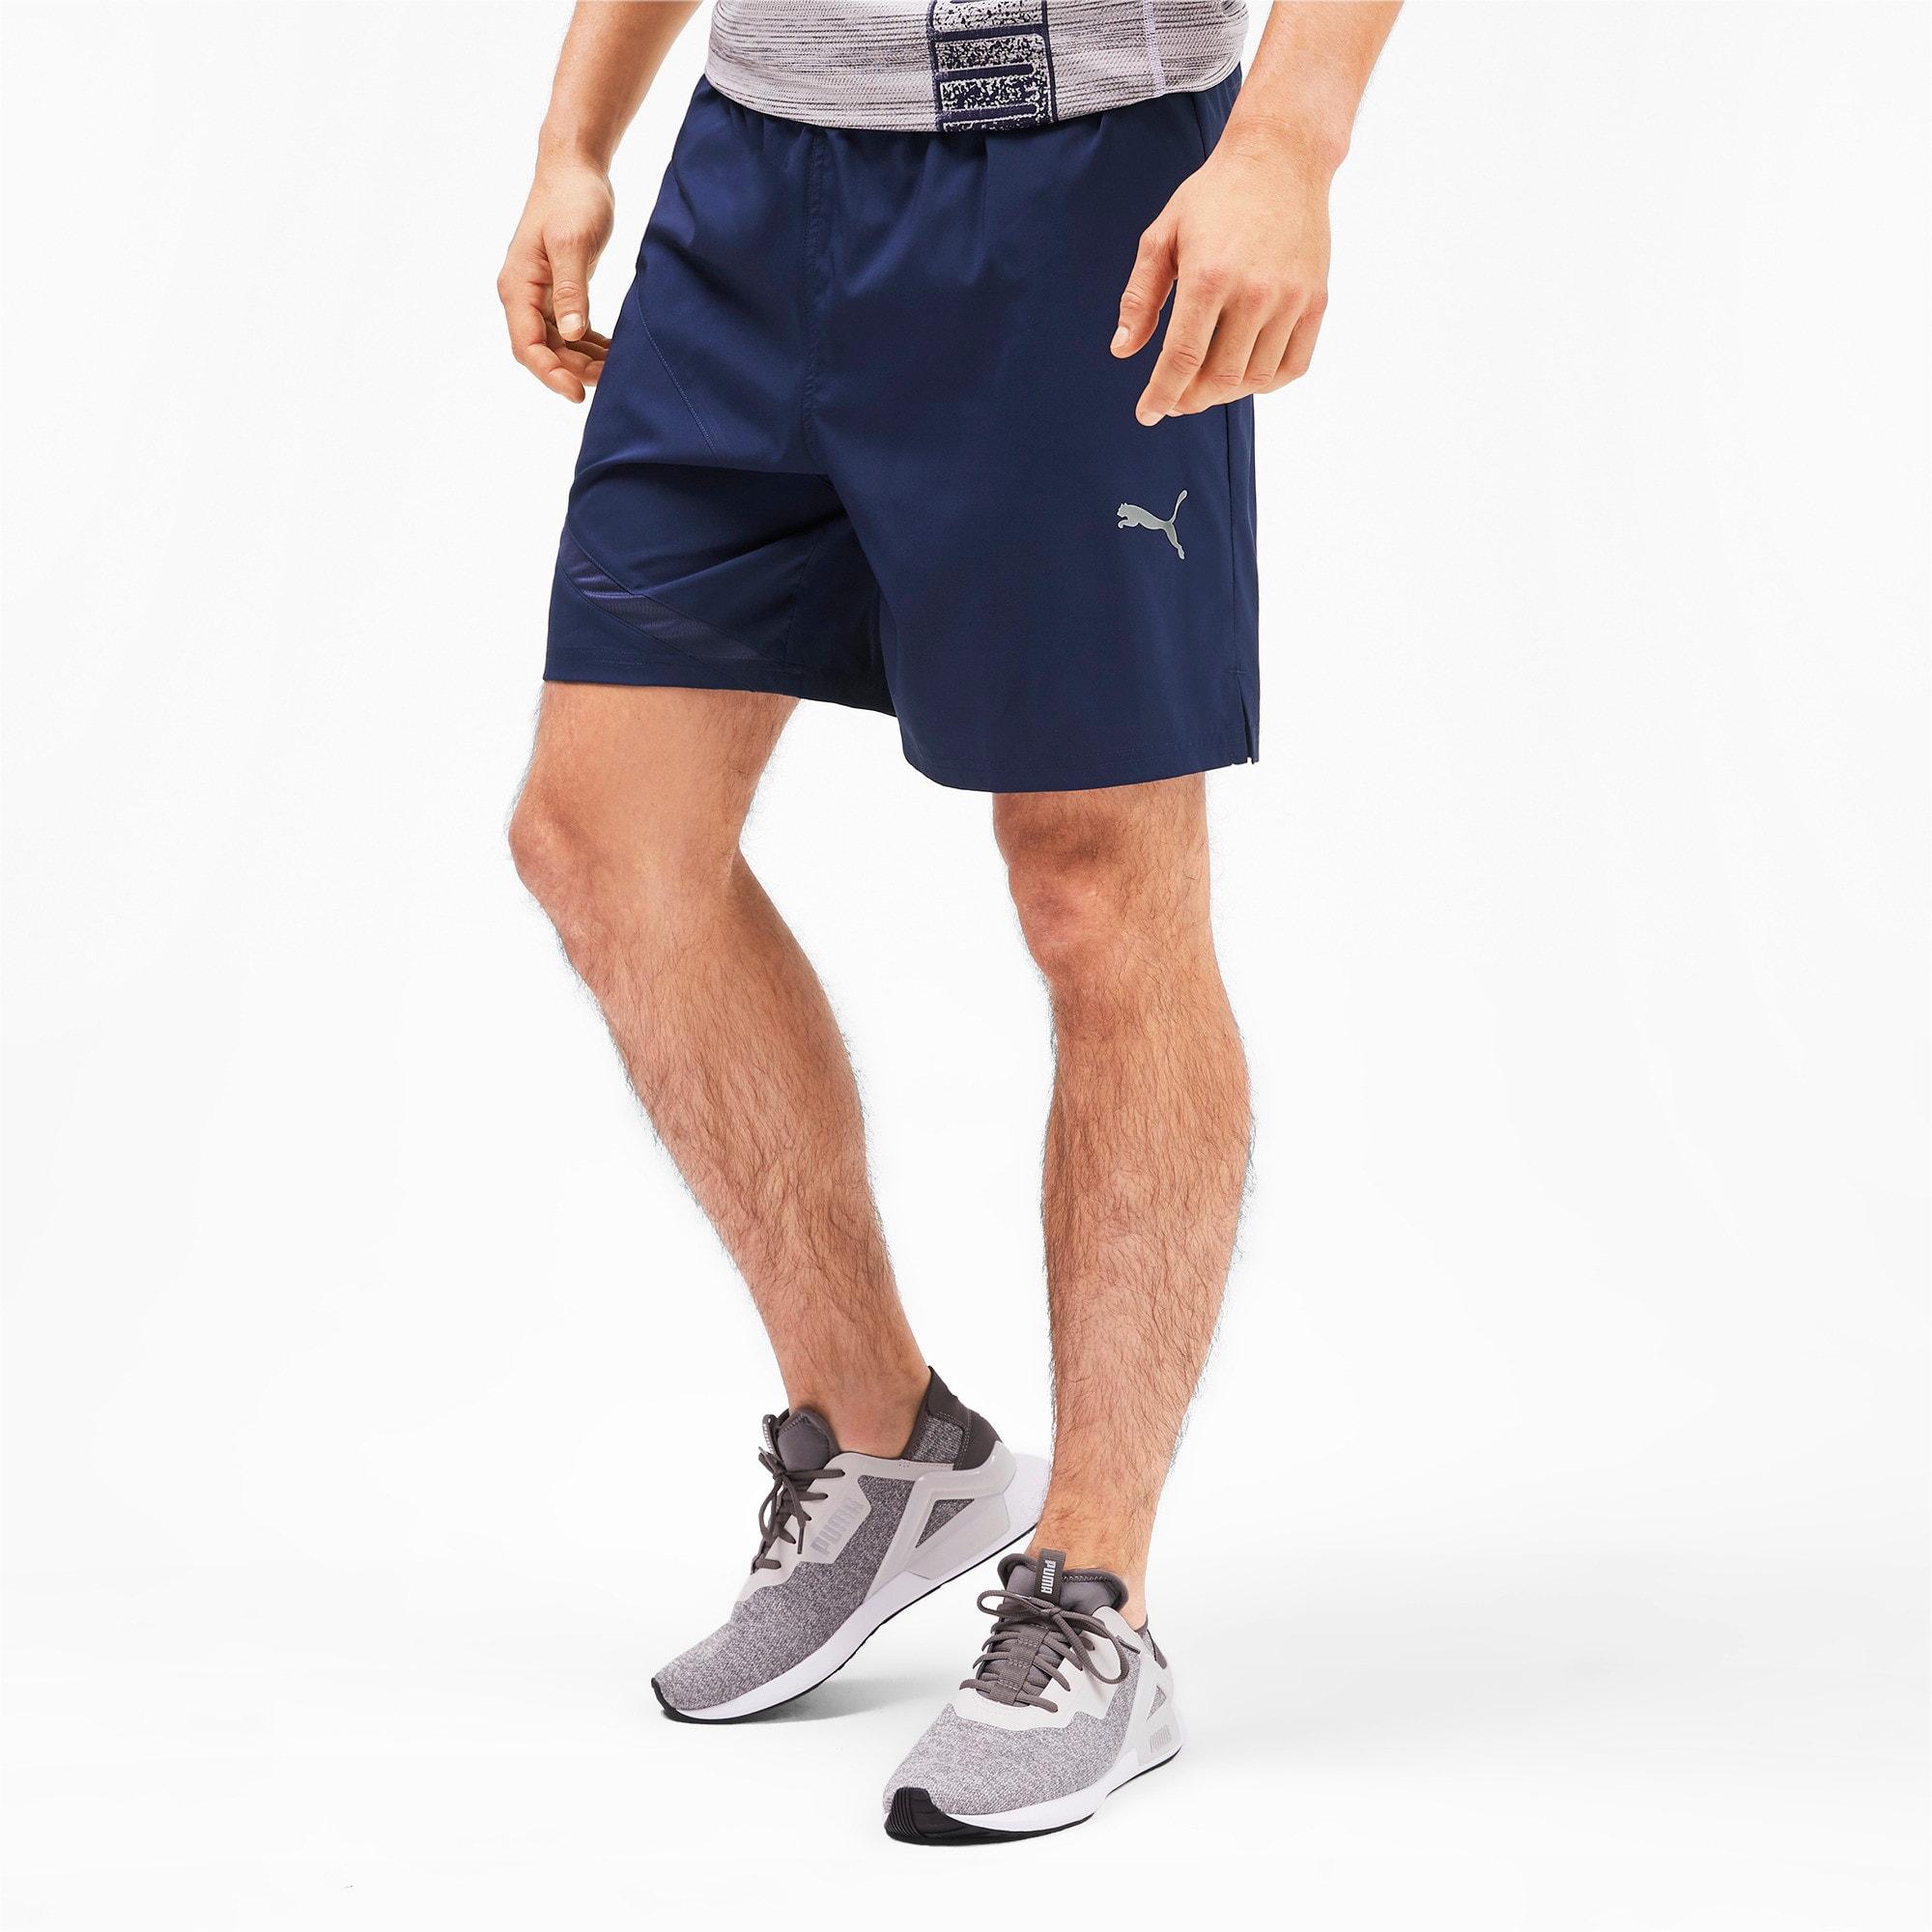 Thumbnail 1 of IGNITE Woven Men's Training Shorts, Peacoat, medium